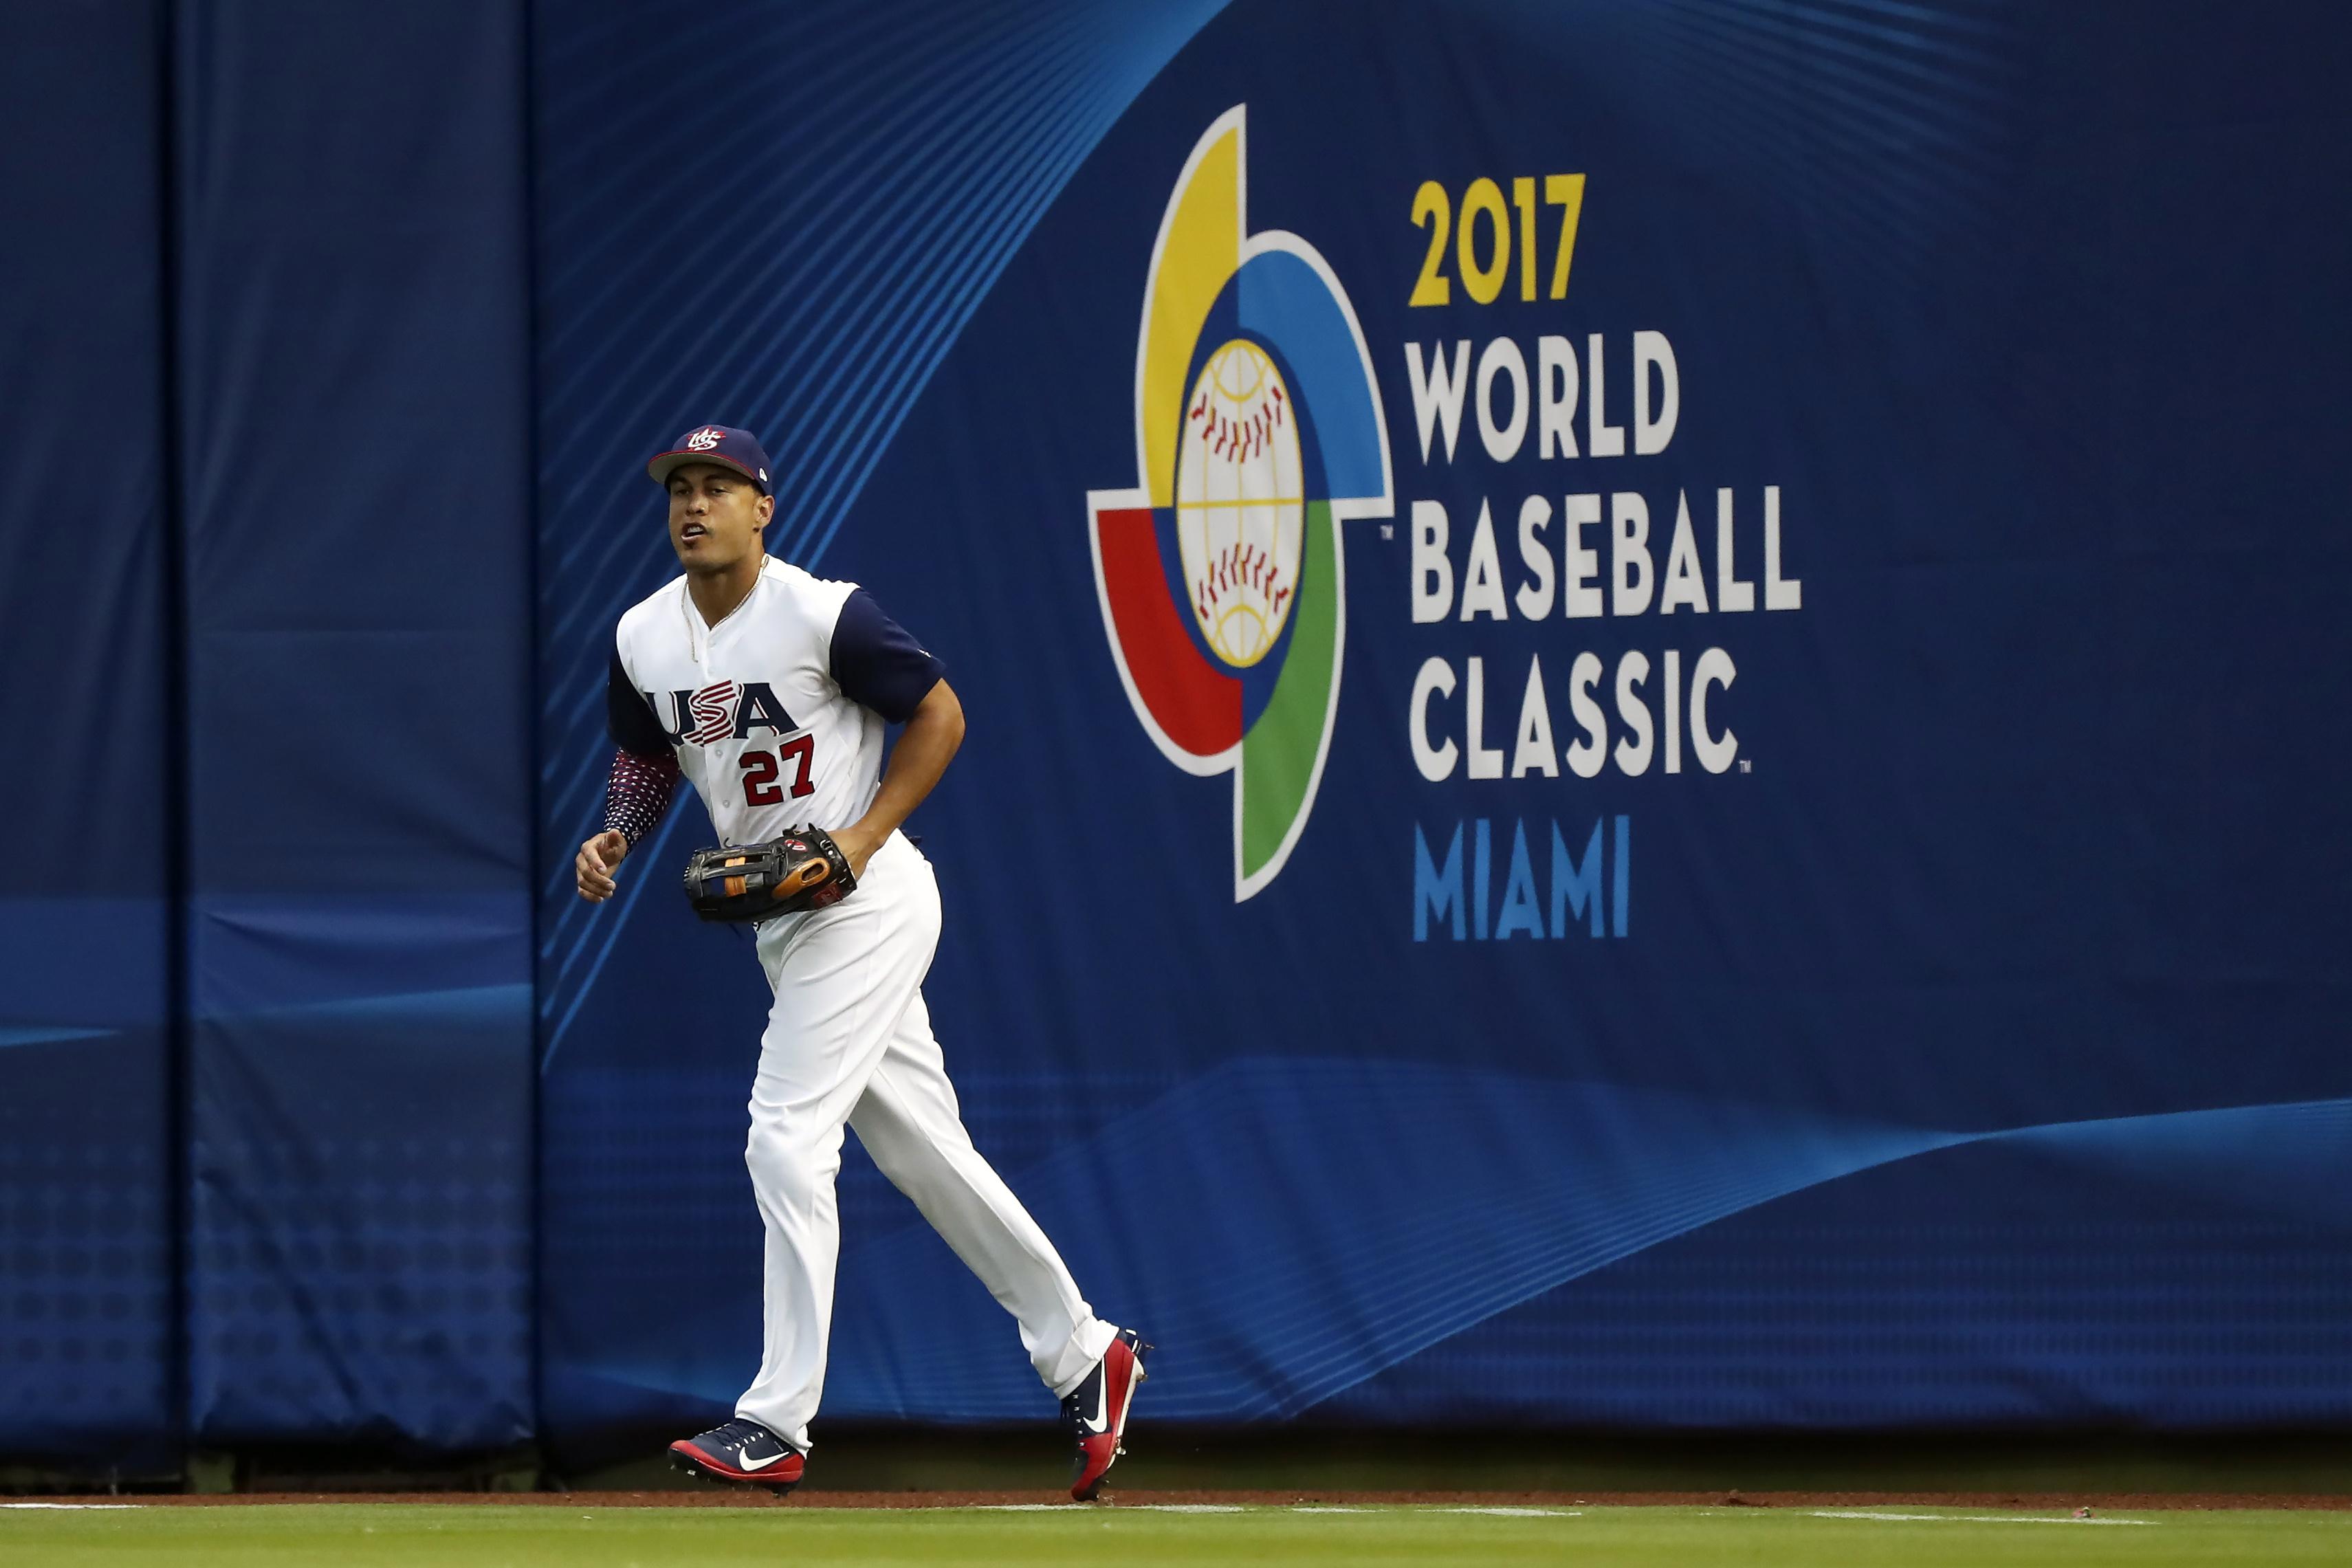 9931770-baseball-world-baseball-classic-colombia-at-usa